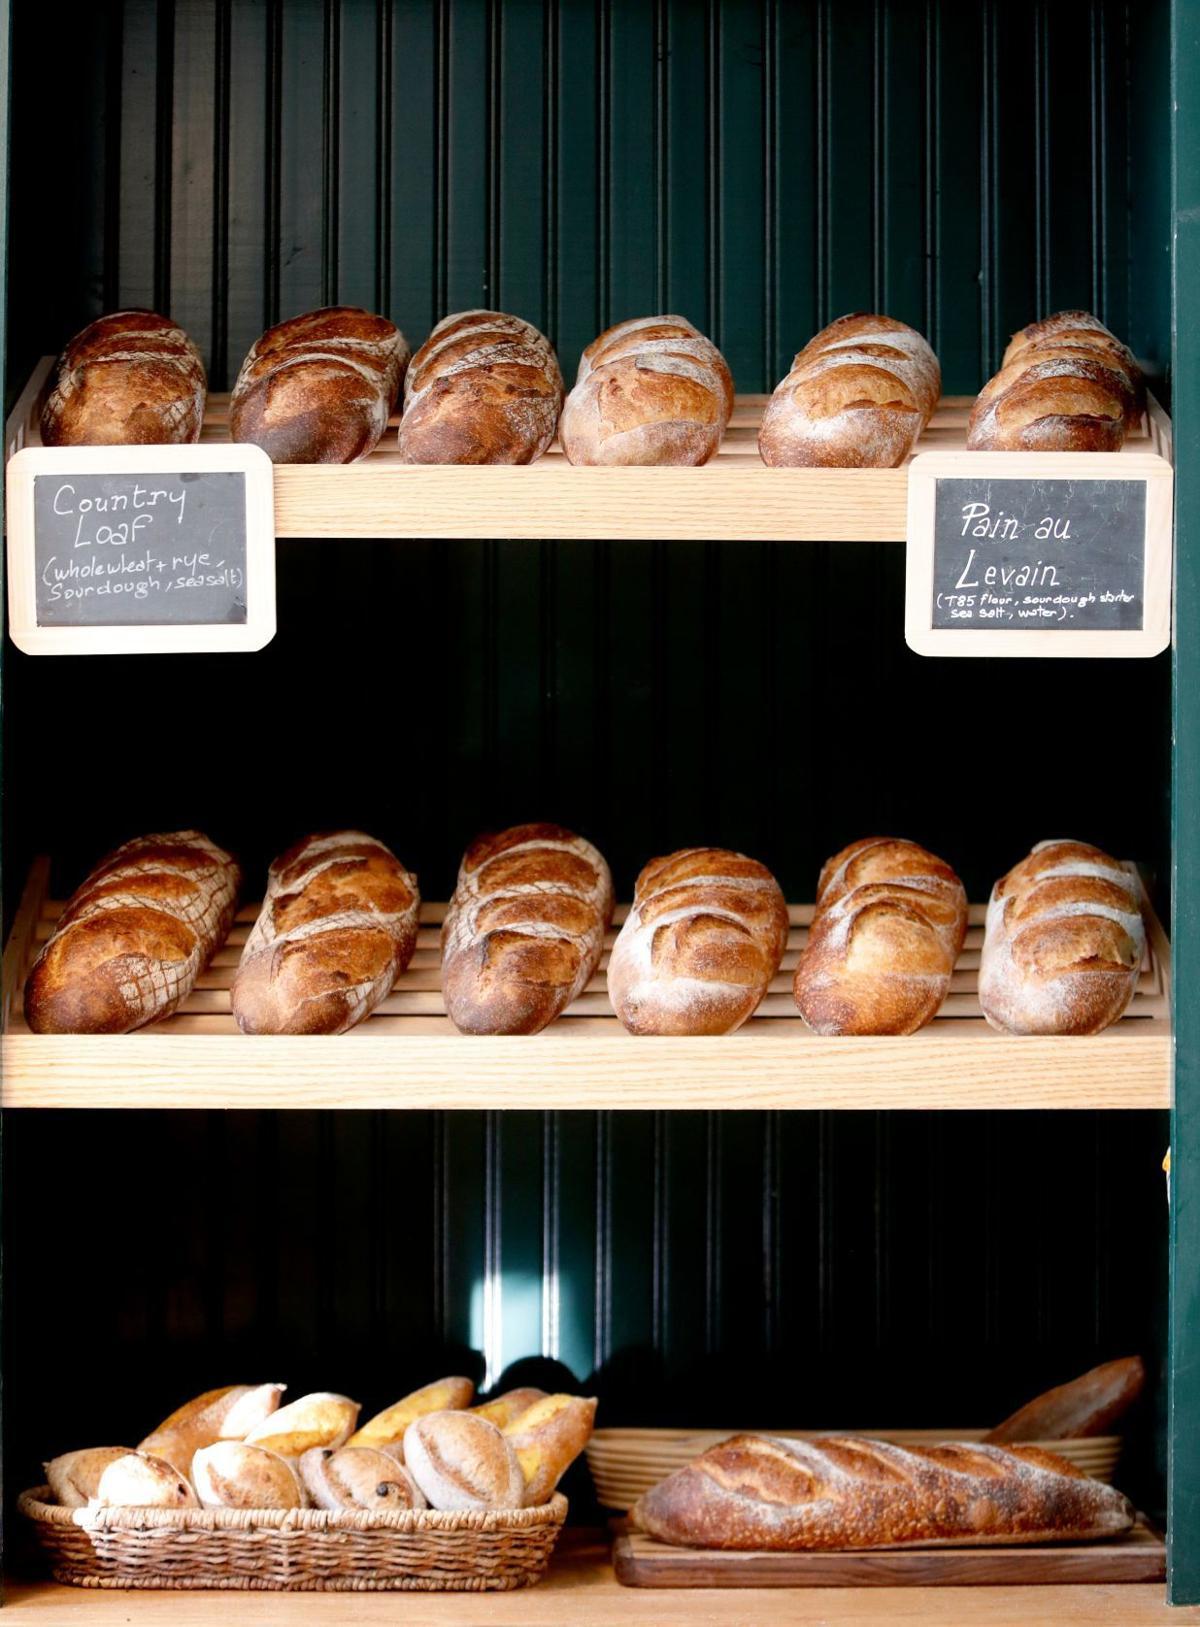 Le Fournil Bakery